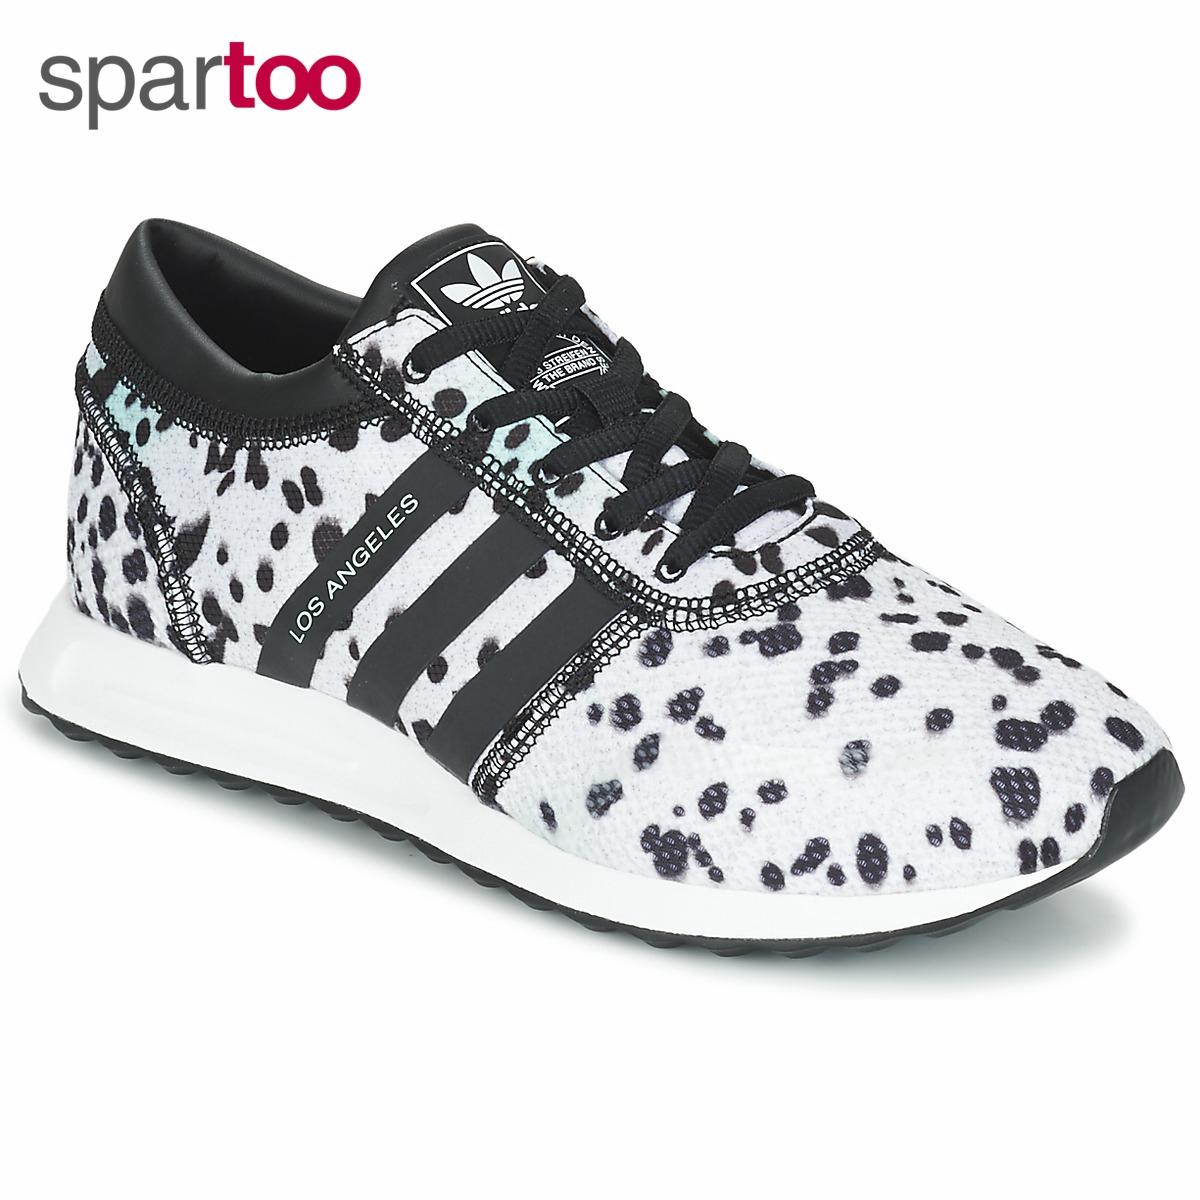 Adidas/阿迪达斯 三叶草款LOS ANGELES女鞋综合训练鞋网球运动鞋